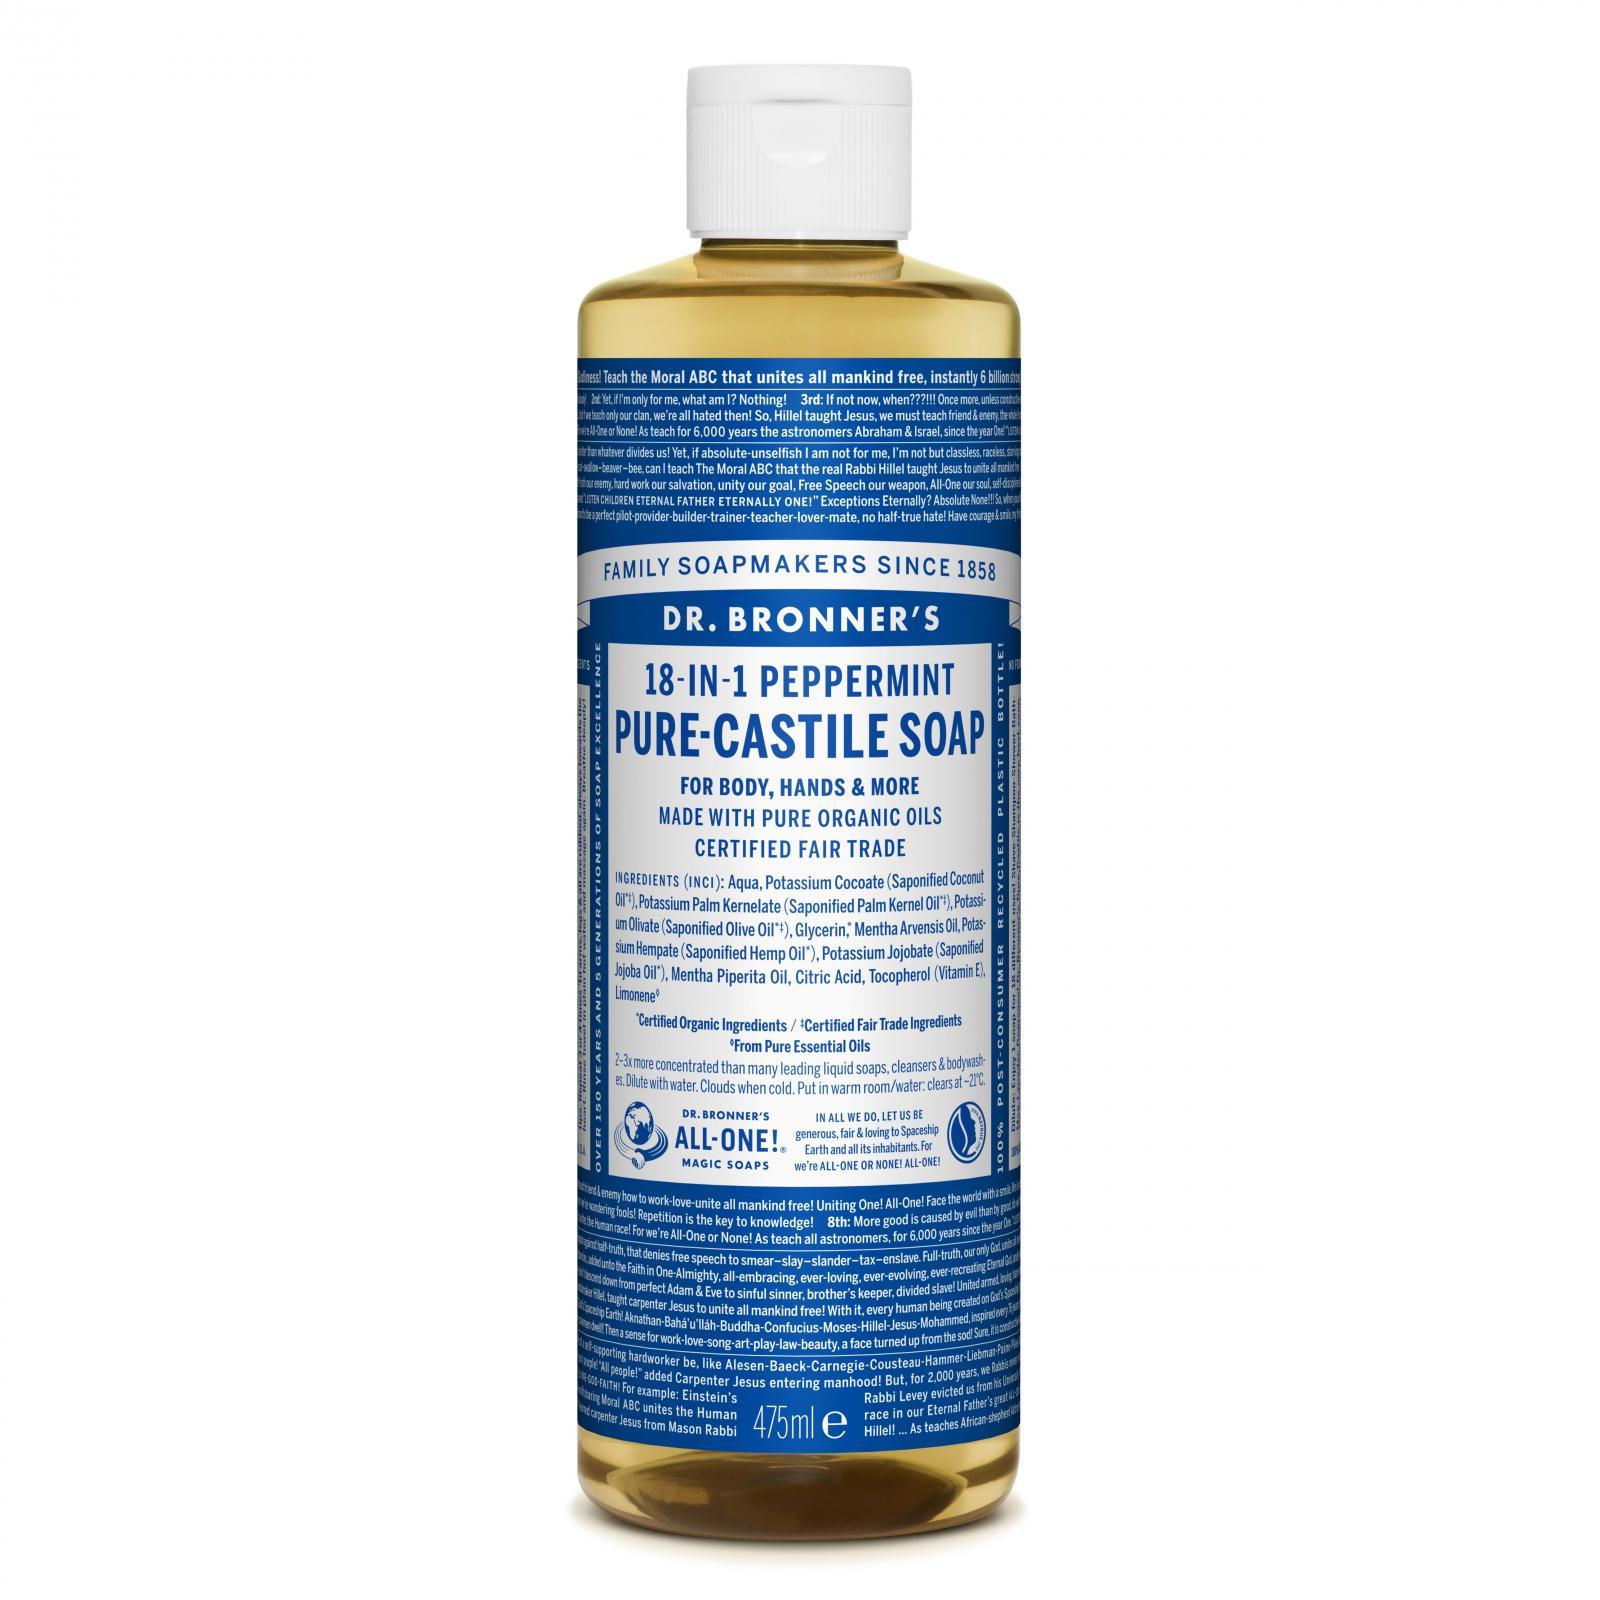 Dr. Bronner´s Tekuté universální mýdlo ALL-ONE!, Peppermint 473 ml